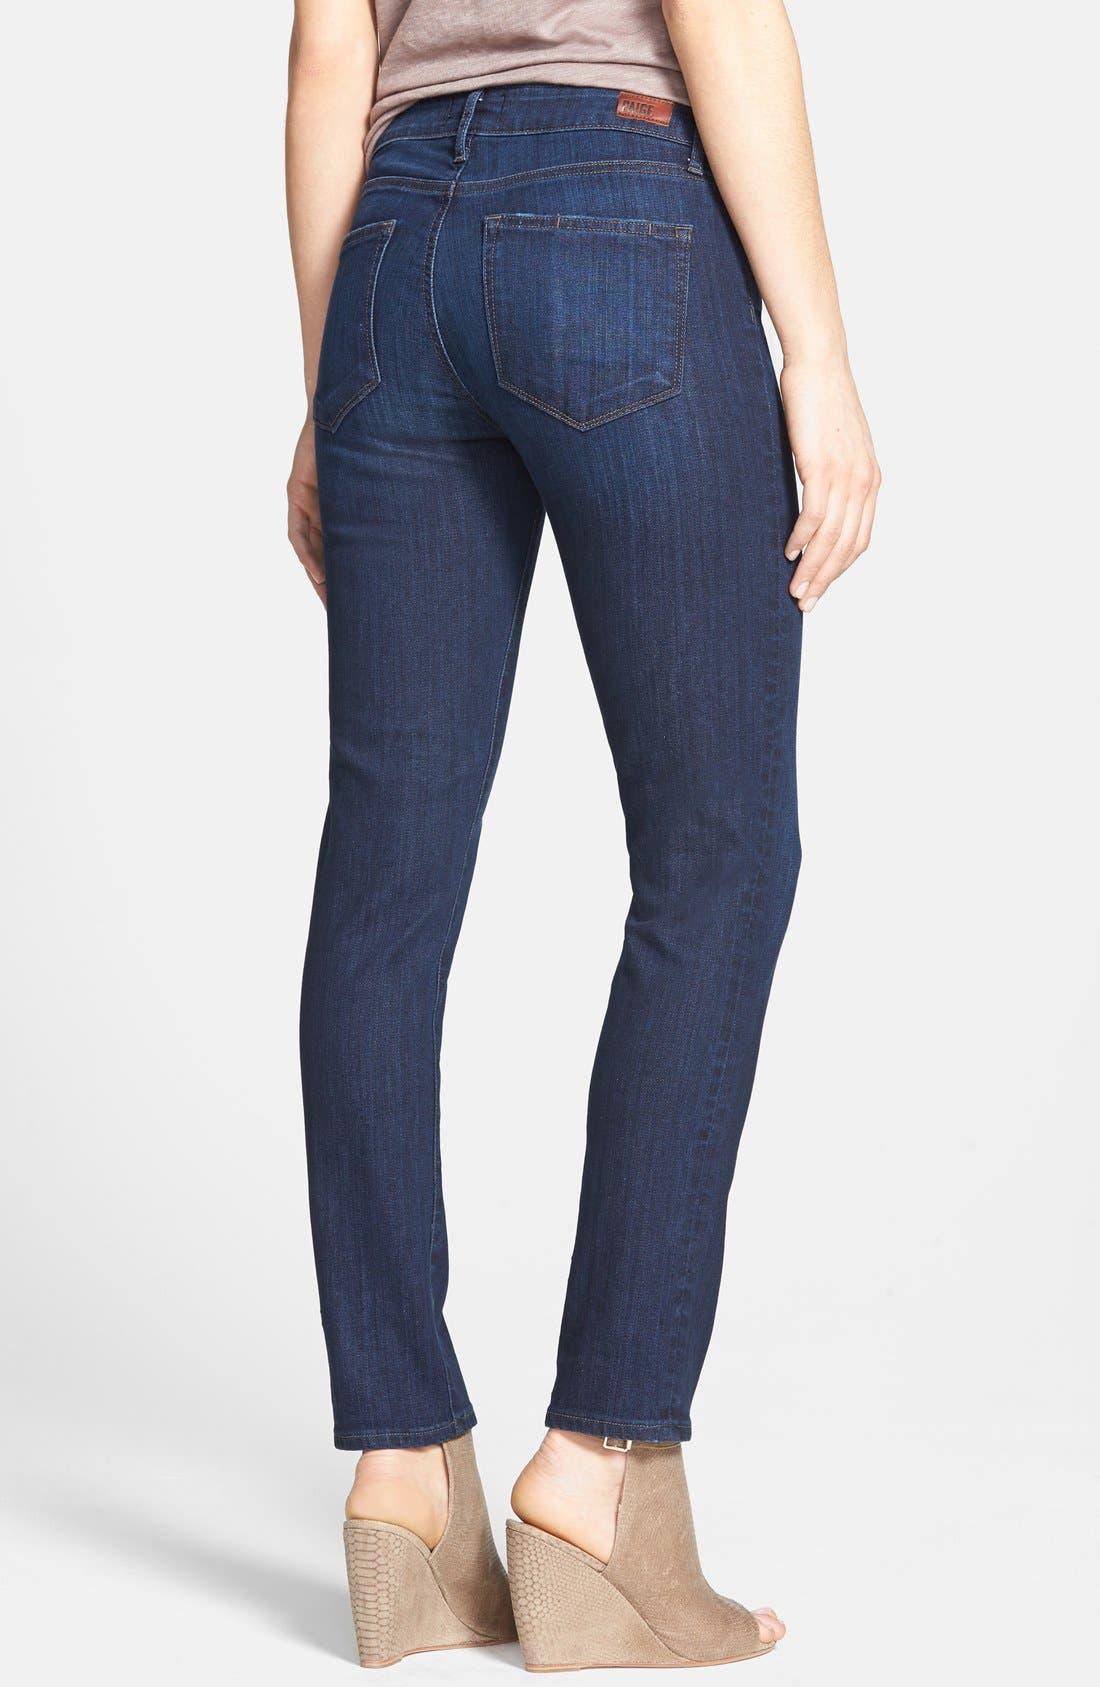 Alternate Image 2  - Paige Denim 'Skyline' Ankle Peg Skinny Jeans (Dixie) (Nordstrom Exclusive)